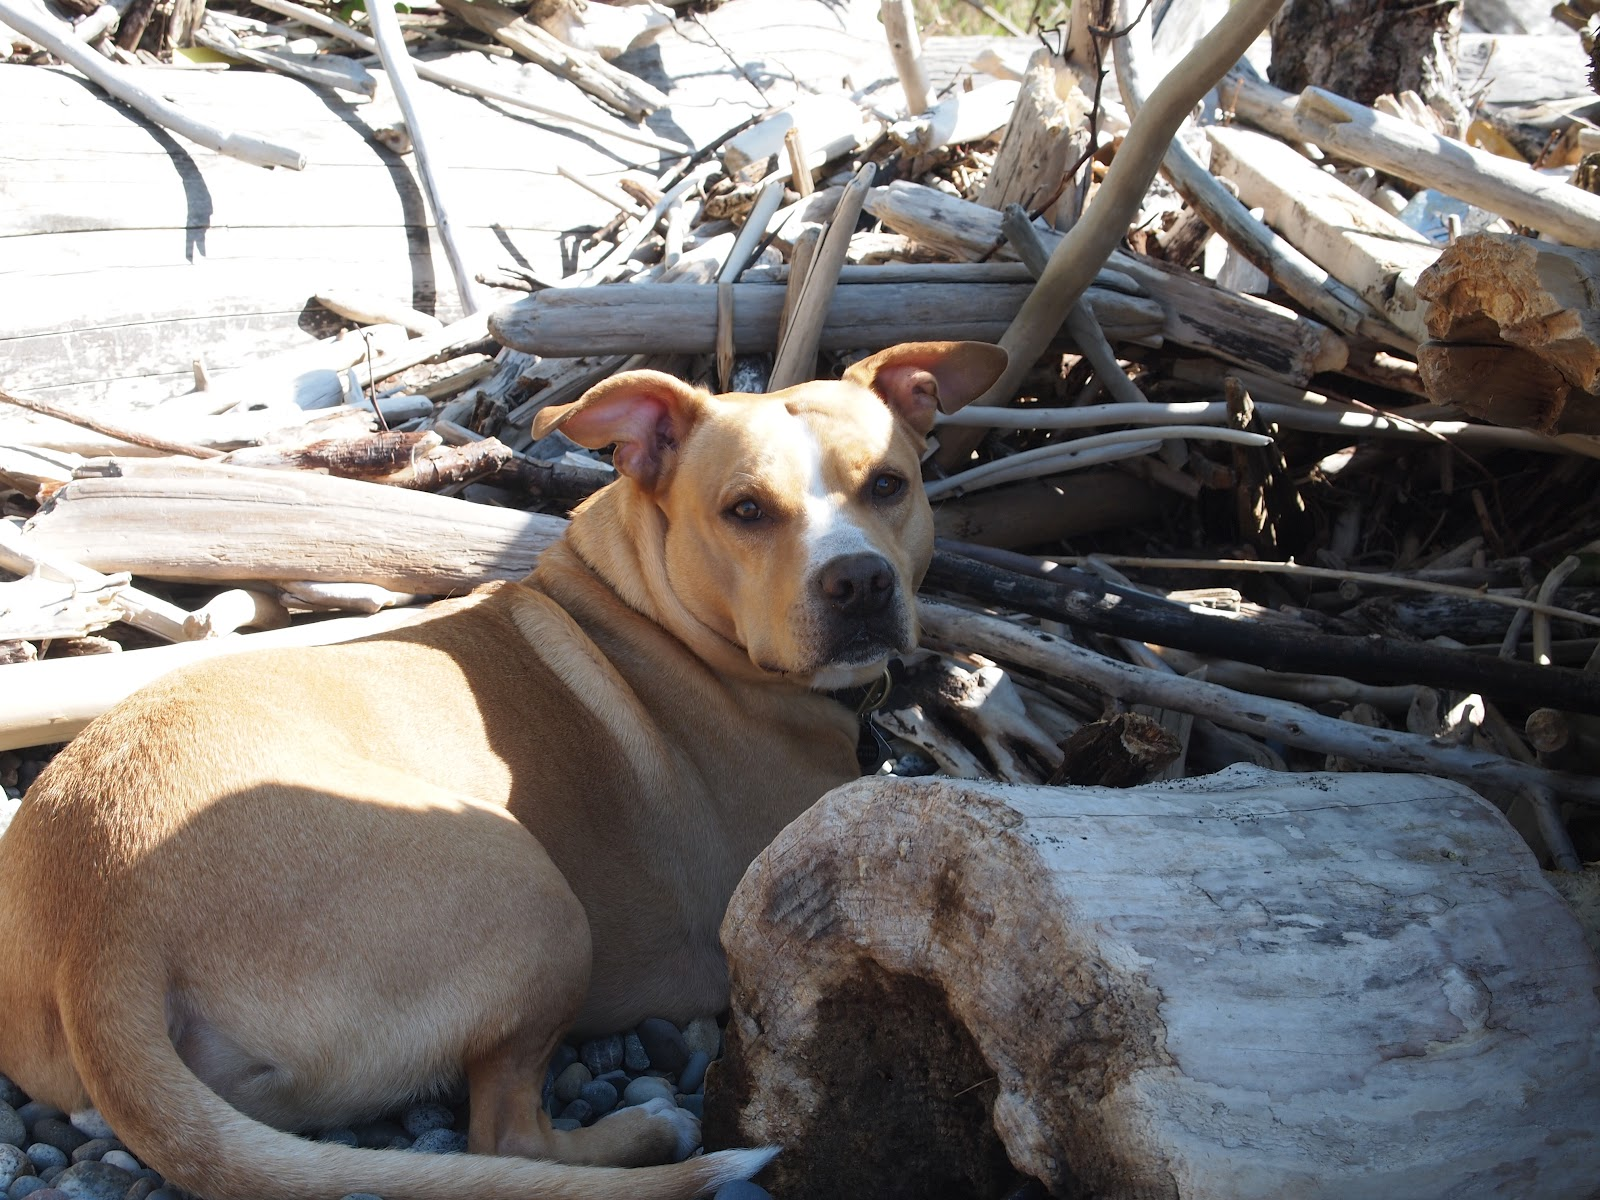 Can I Take An Esa Dog To A Beach